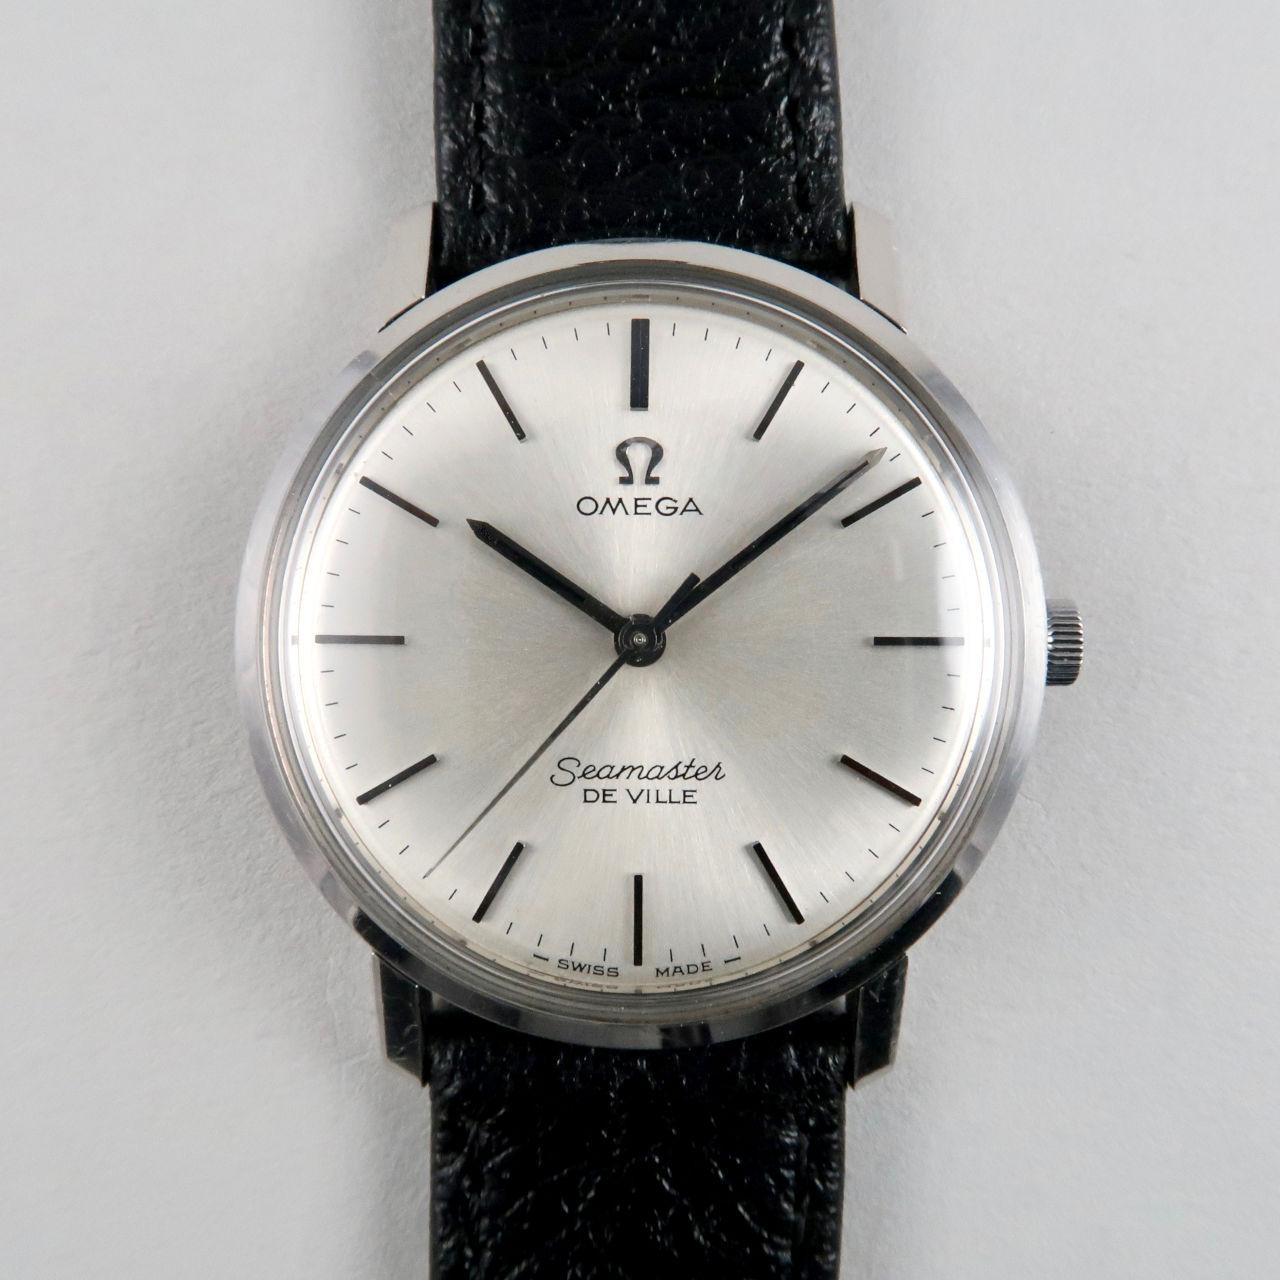 Omega Seamaster de Ville Ref. 135.010 vintage wristwatch, circa 1965